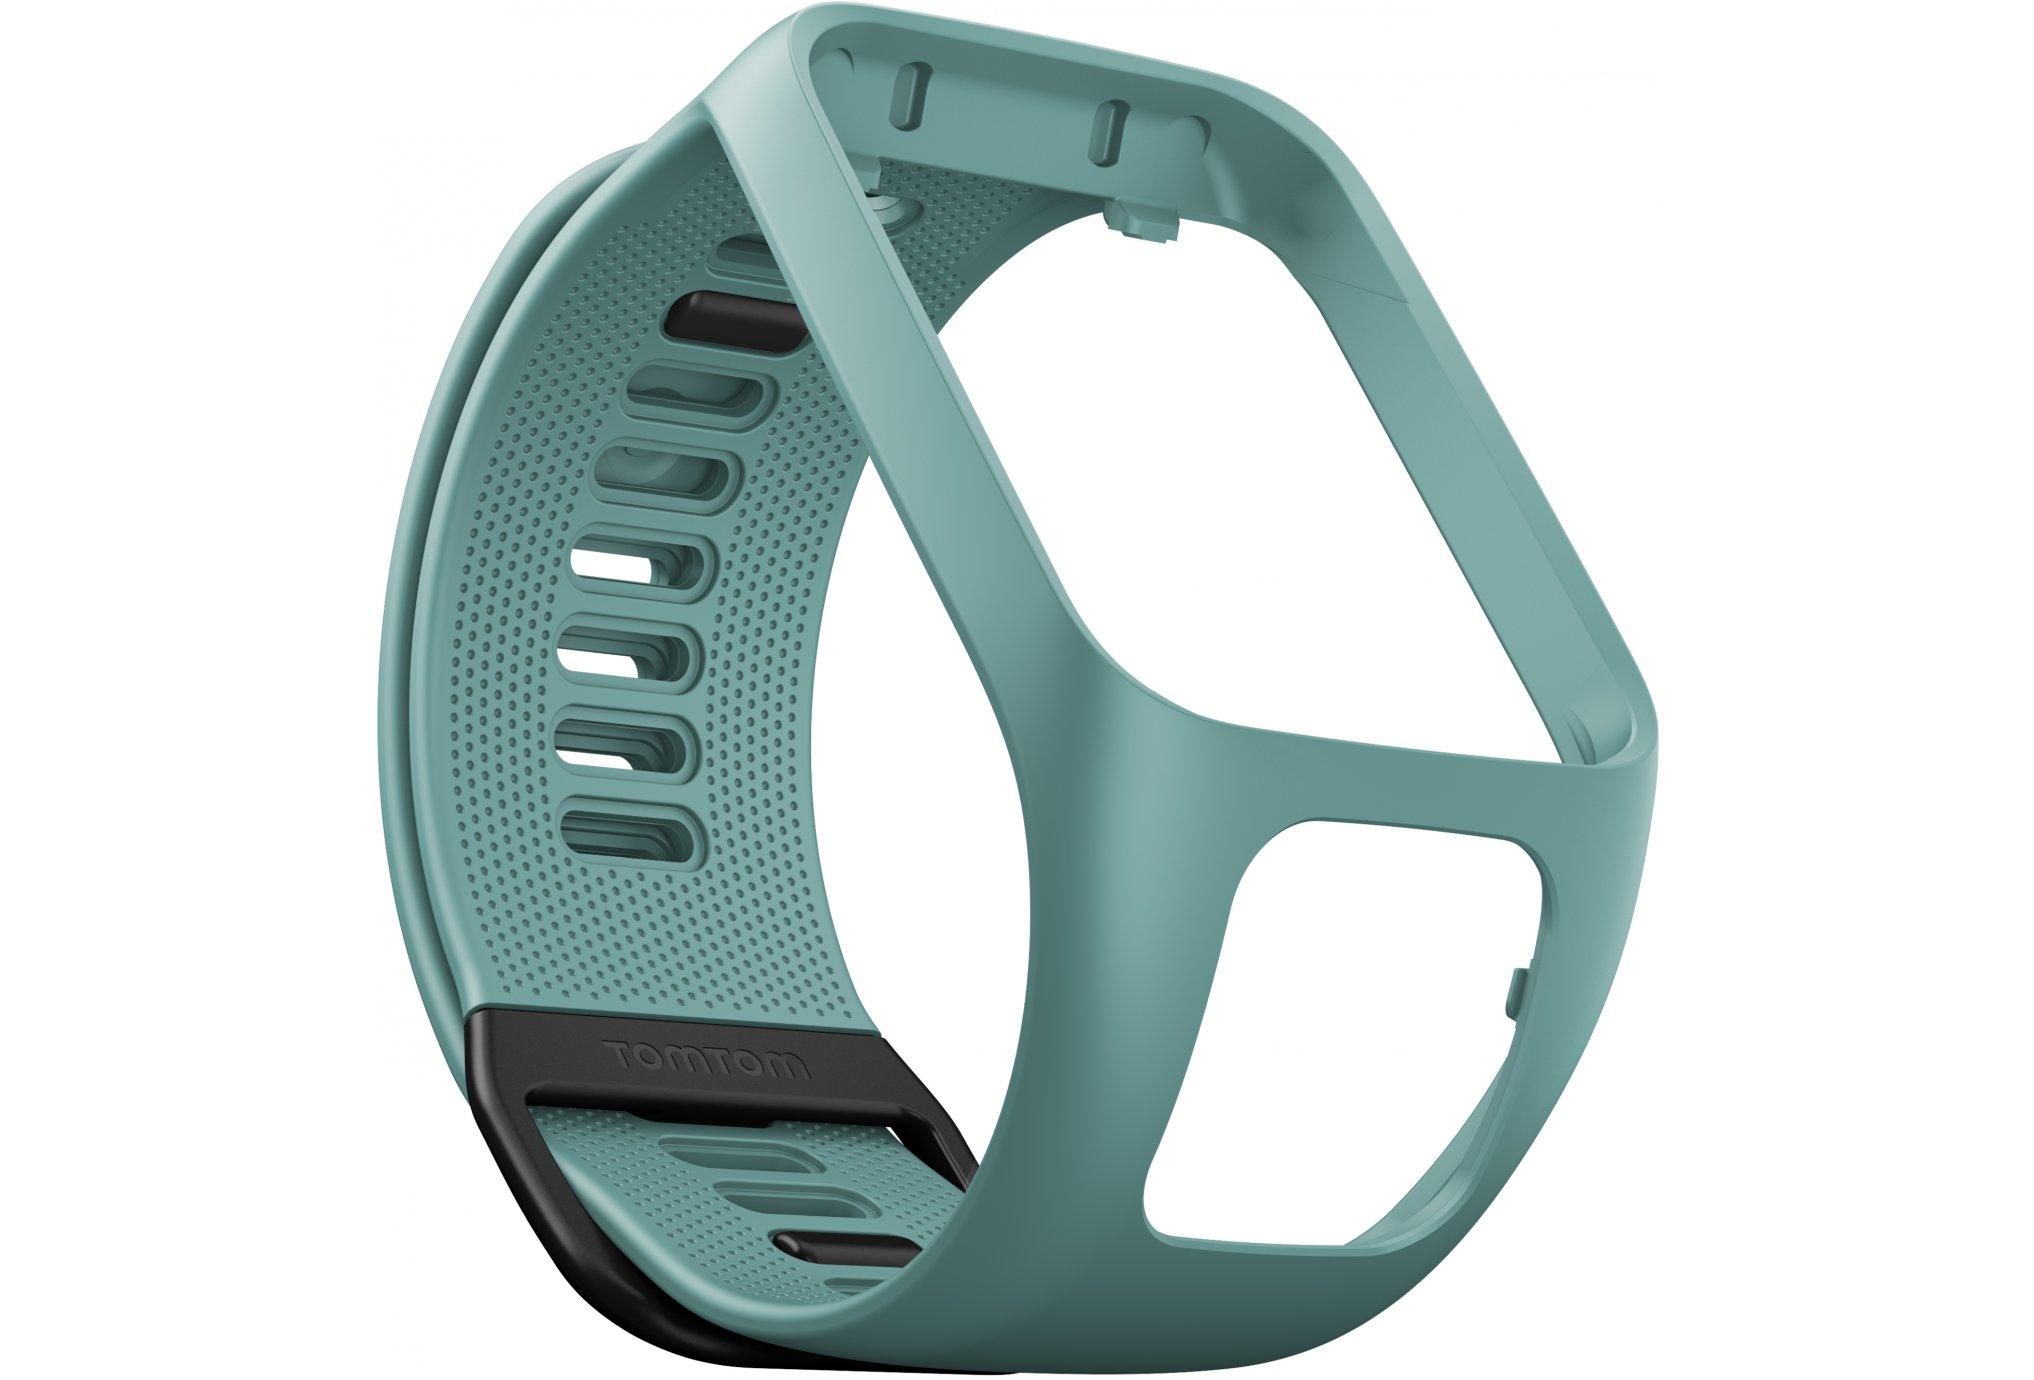 Tomtom Bracelet runner3/adventurer - large accessoires montres/ bracelets